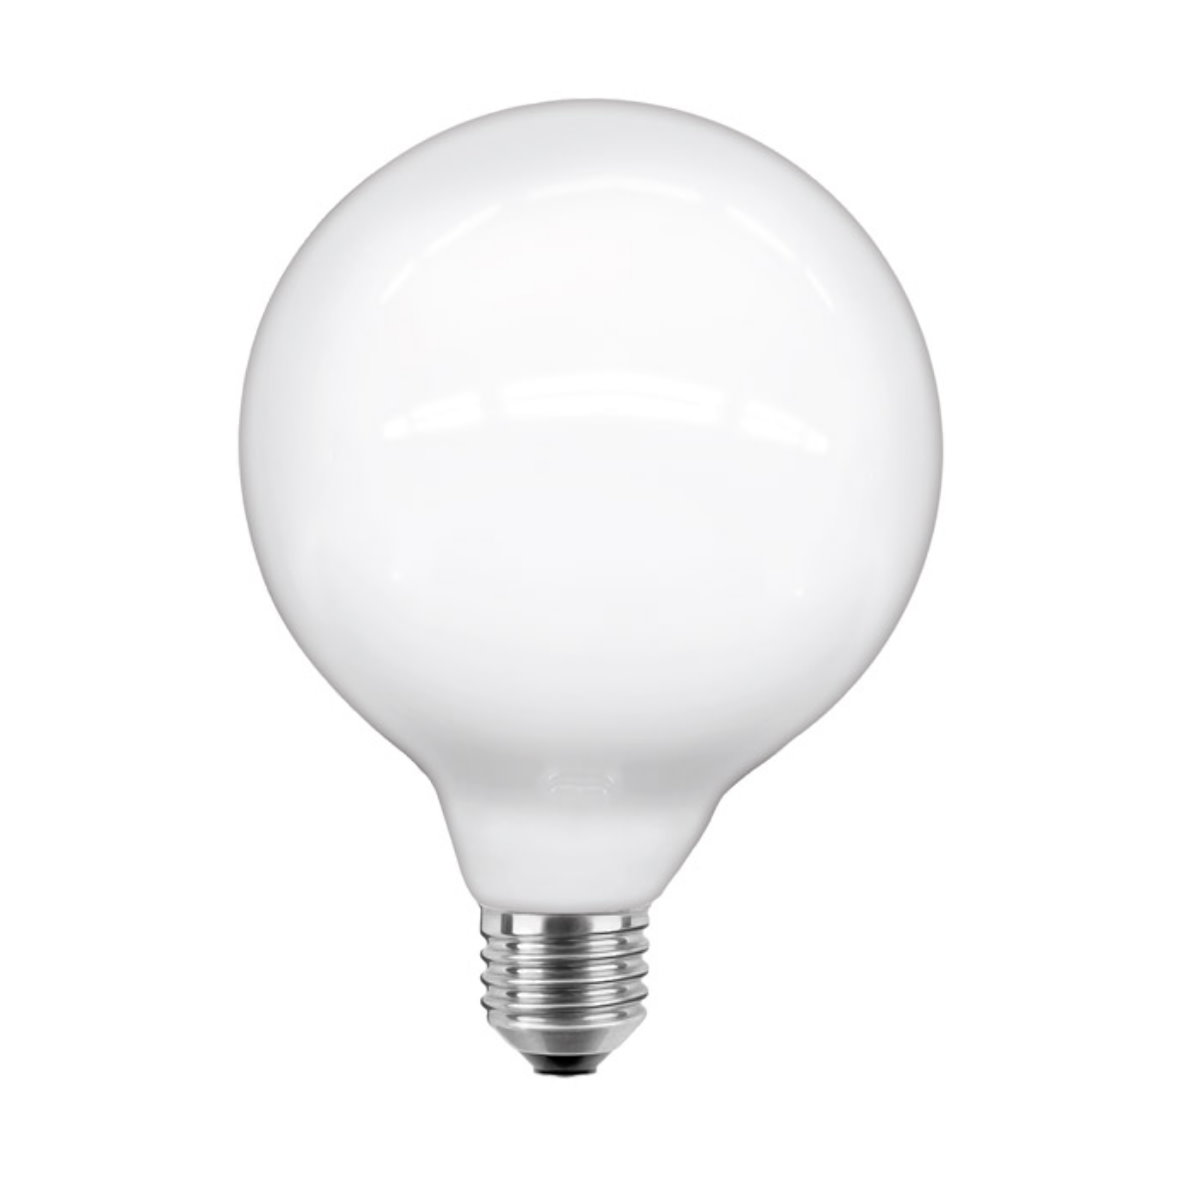 segula smd led birne rund e14 e27 leuchtmittel dimmable dimmbar lampe bulb 230v ebay. Black Bedroom Furniture Sets. Home Design Ideas